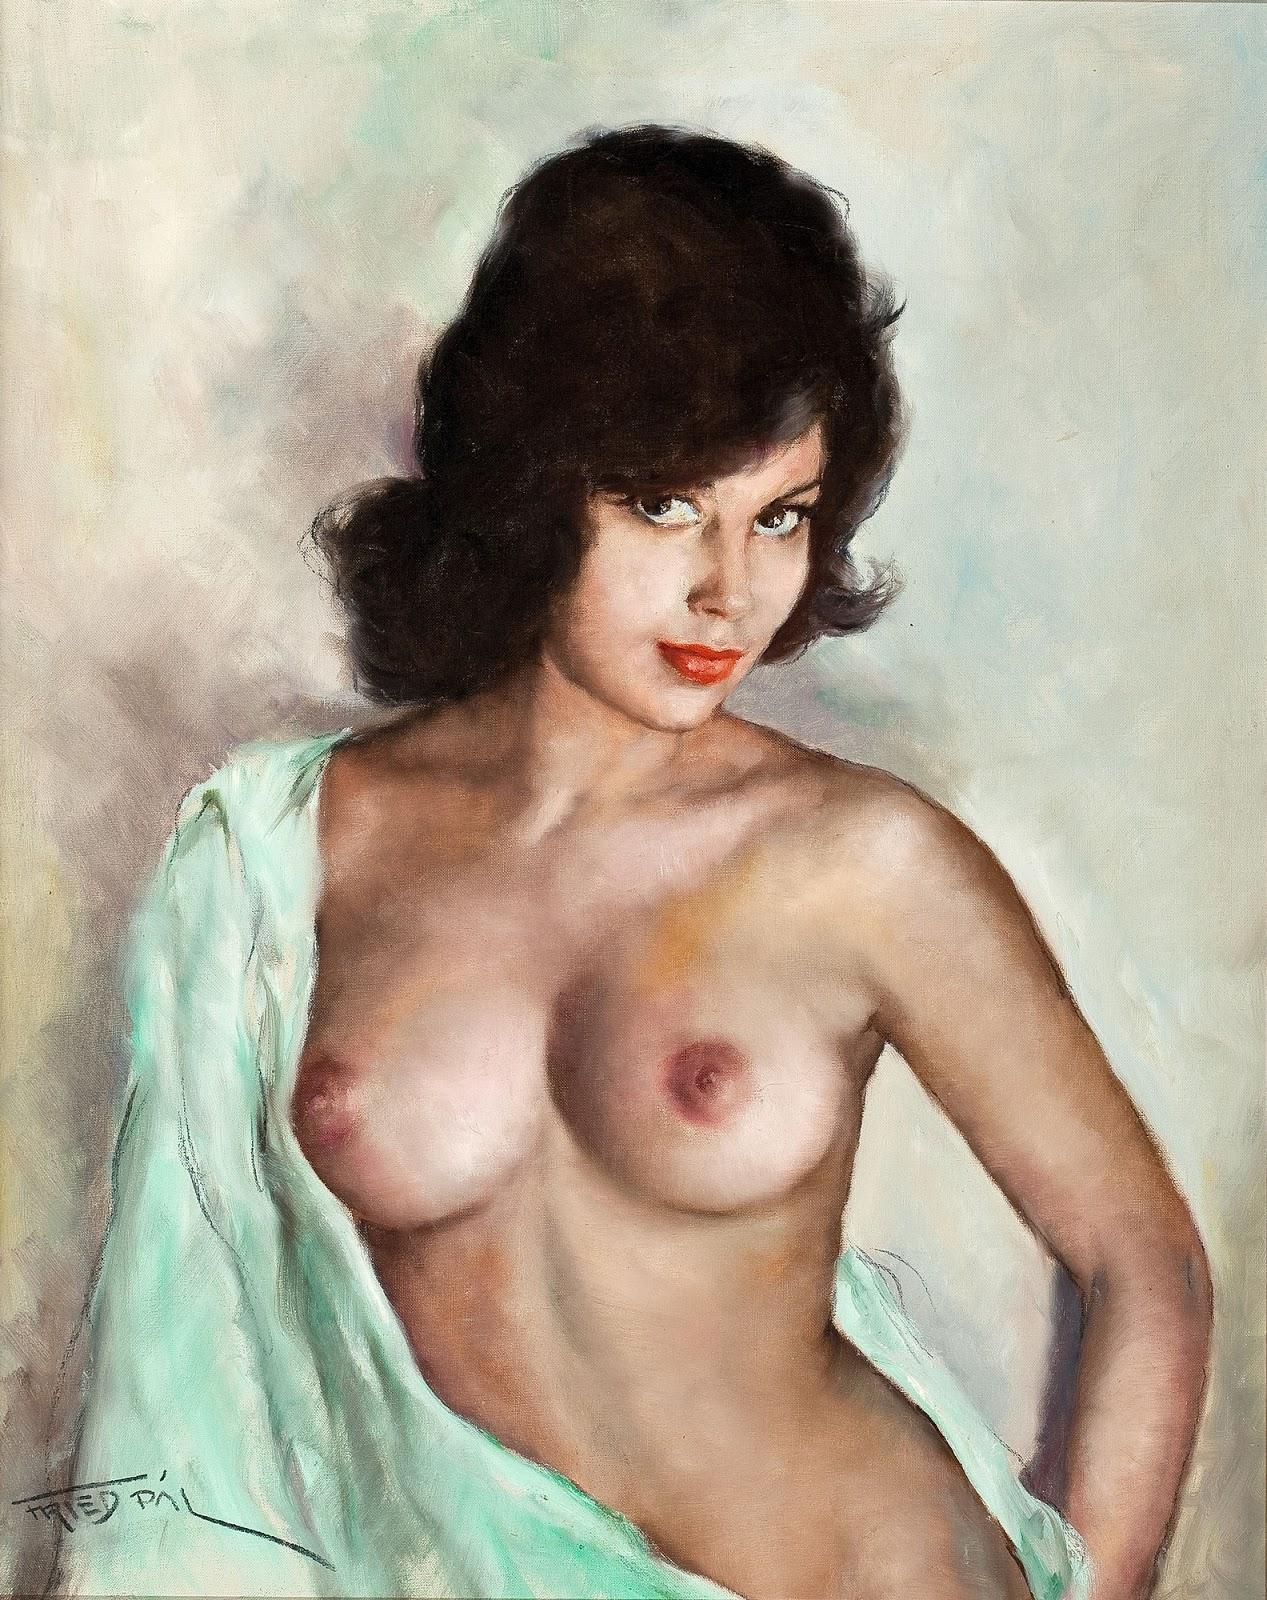 Картинки по запросу Pál Fried 1893 - 1976 nude